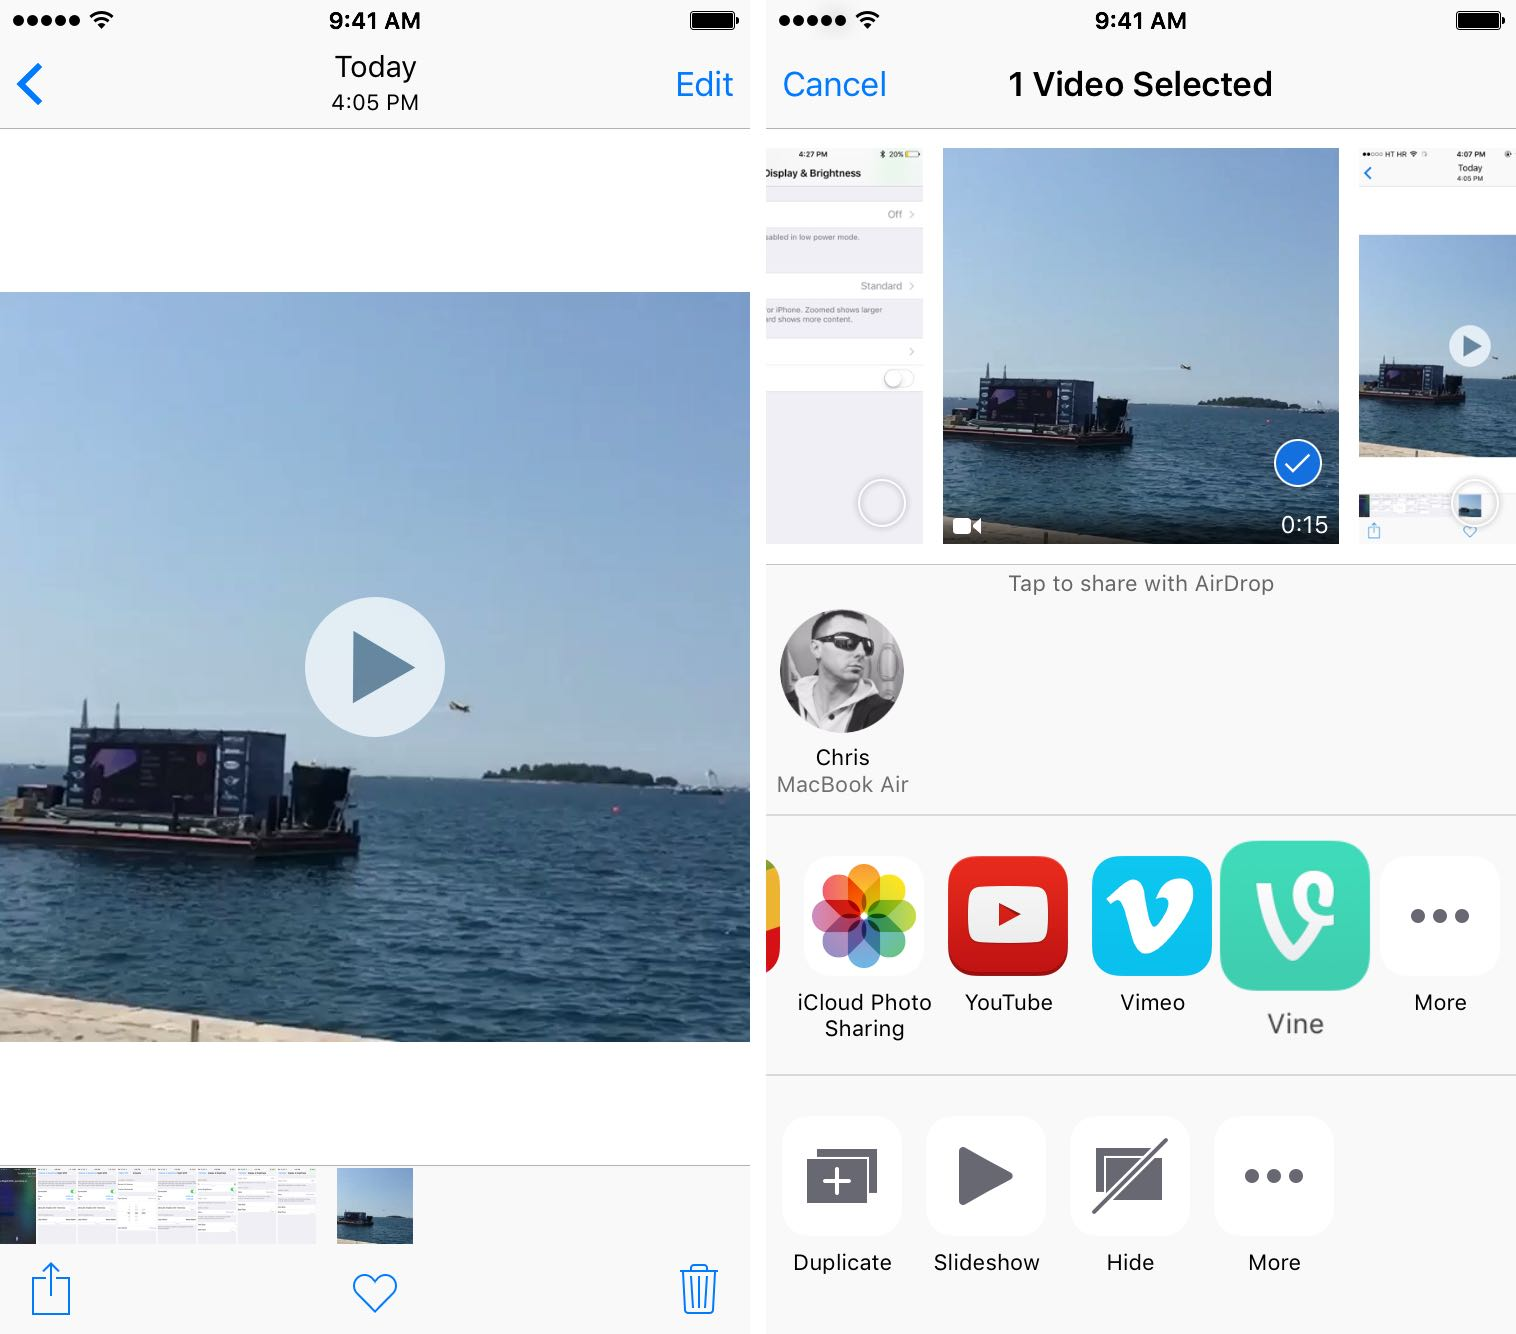 iOS 9.3 Photos Share video to Vine iPhone screenshot 001